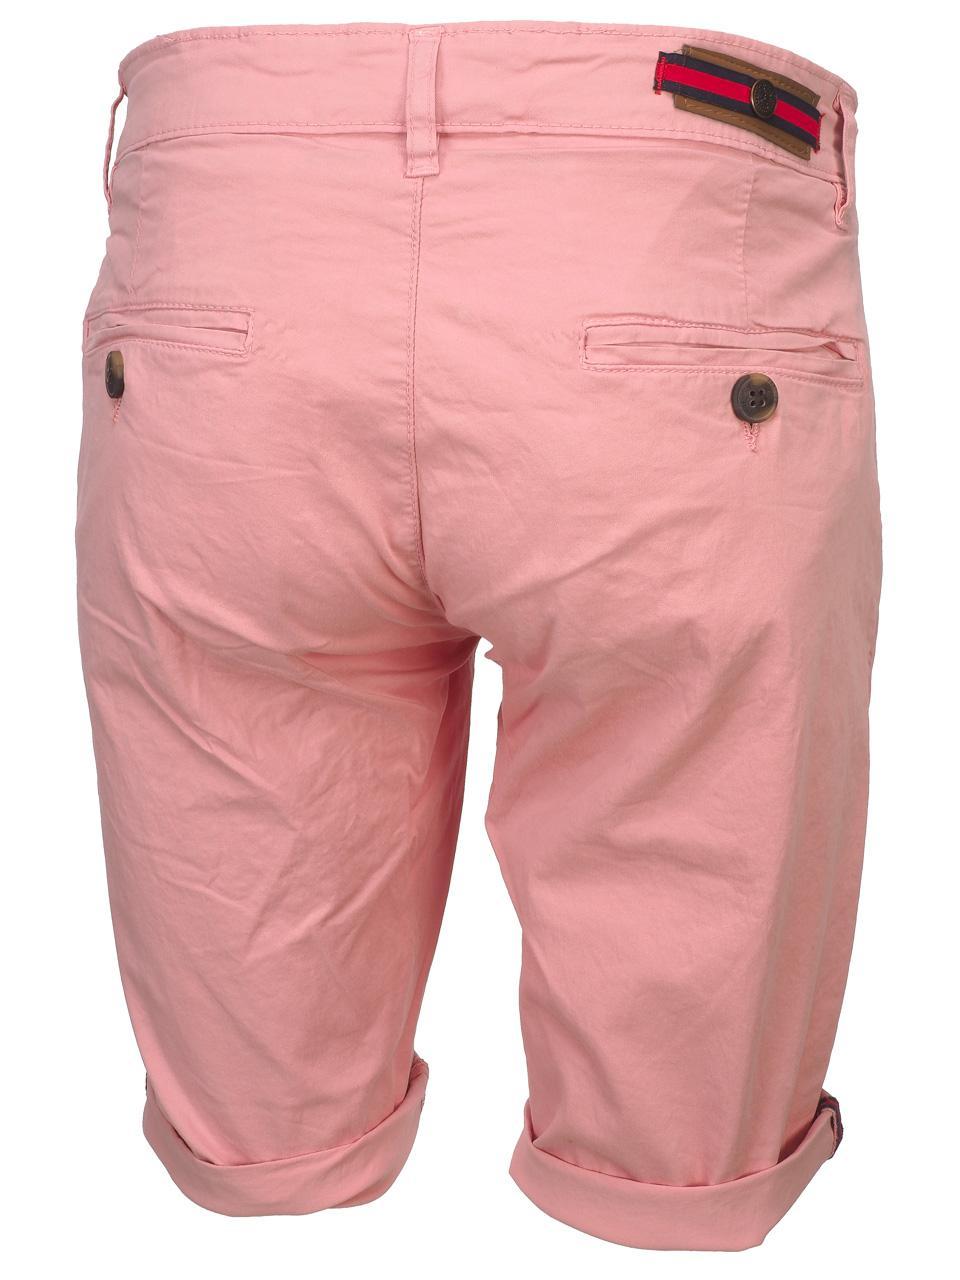 Bermuda-Shorts-Hite-Couture-Vobier-Rse-Bermuda-Chino-Pink-11606-New thumbnail 5